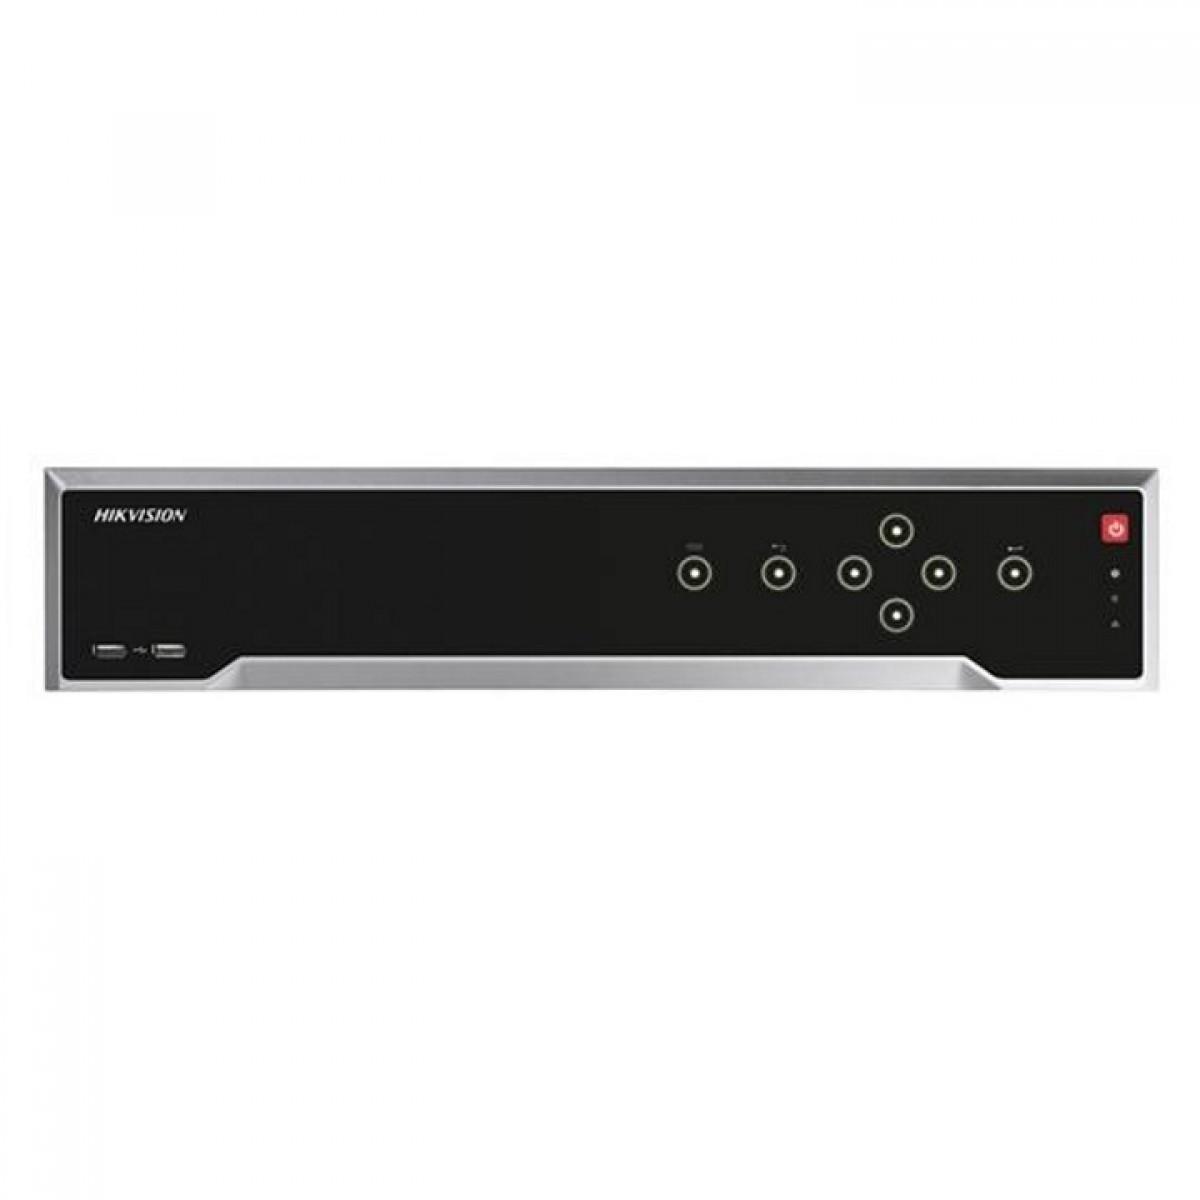 Hikvision DS-7732NI-I4 32 Channel 4K UHD 12MP Ultra HD 1080P P2P VCA Alarm Full HD Network Video Recorder 1.5U 16CH CCTV